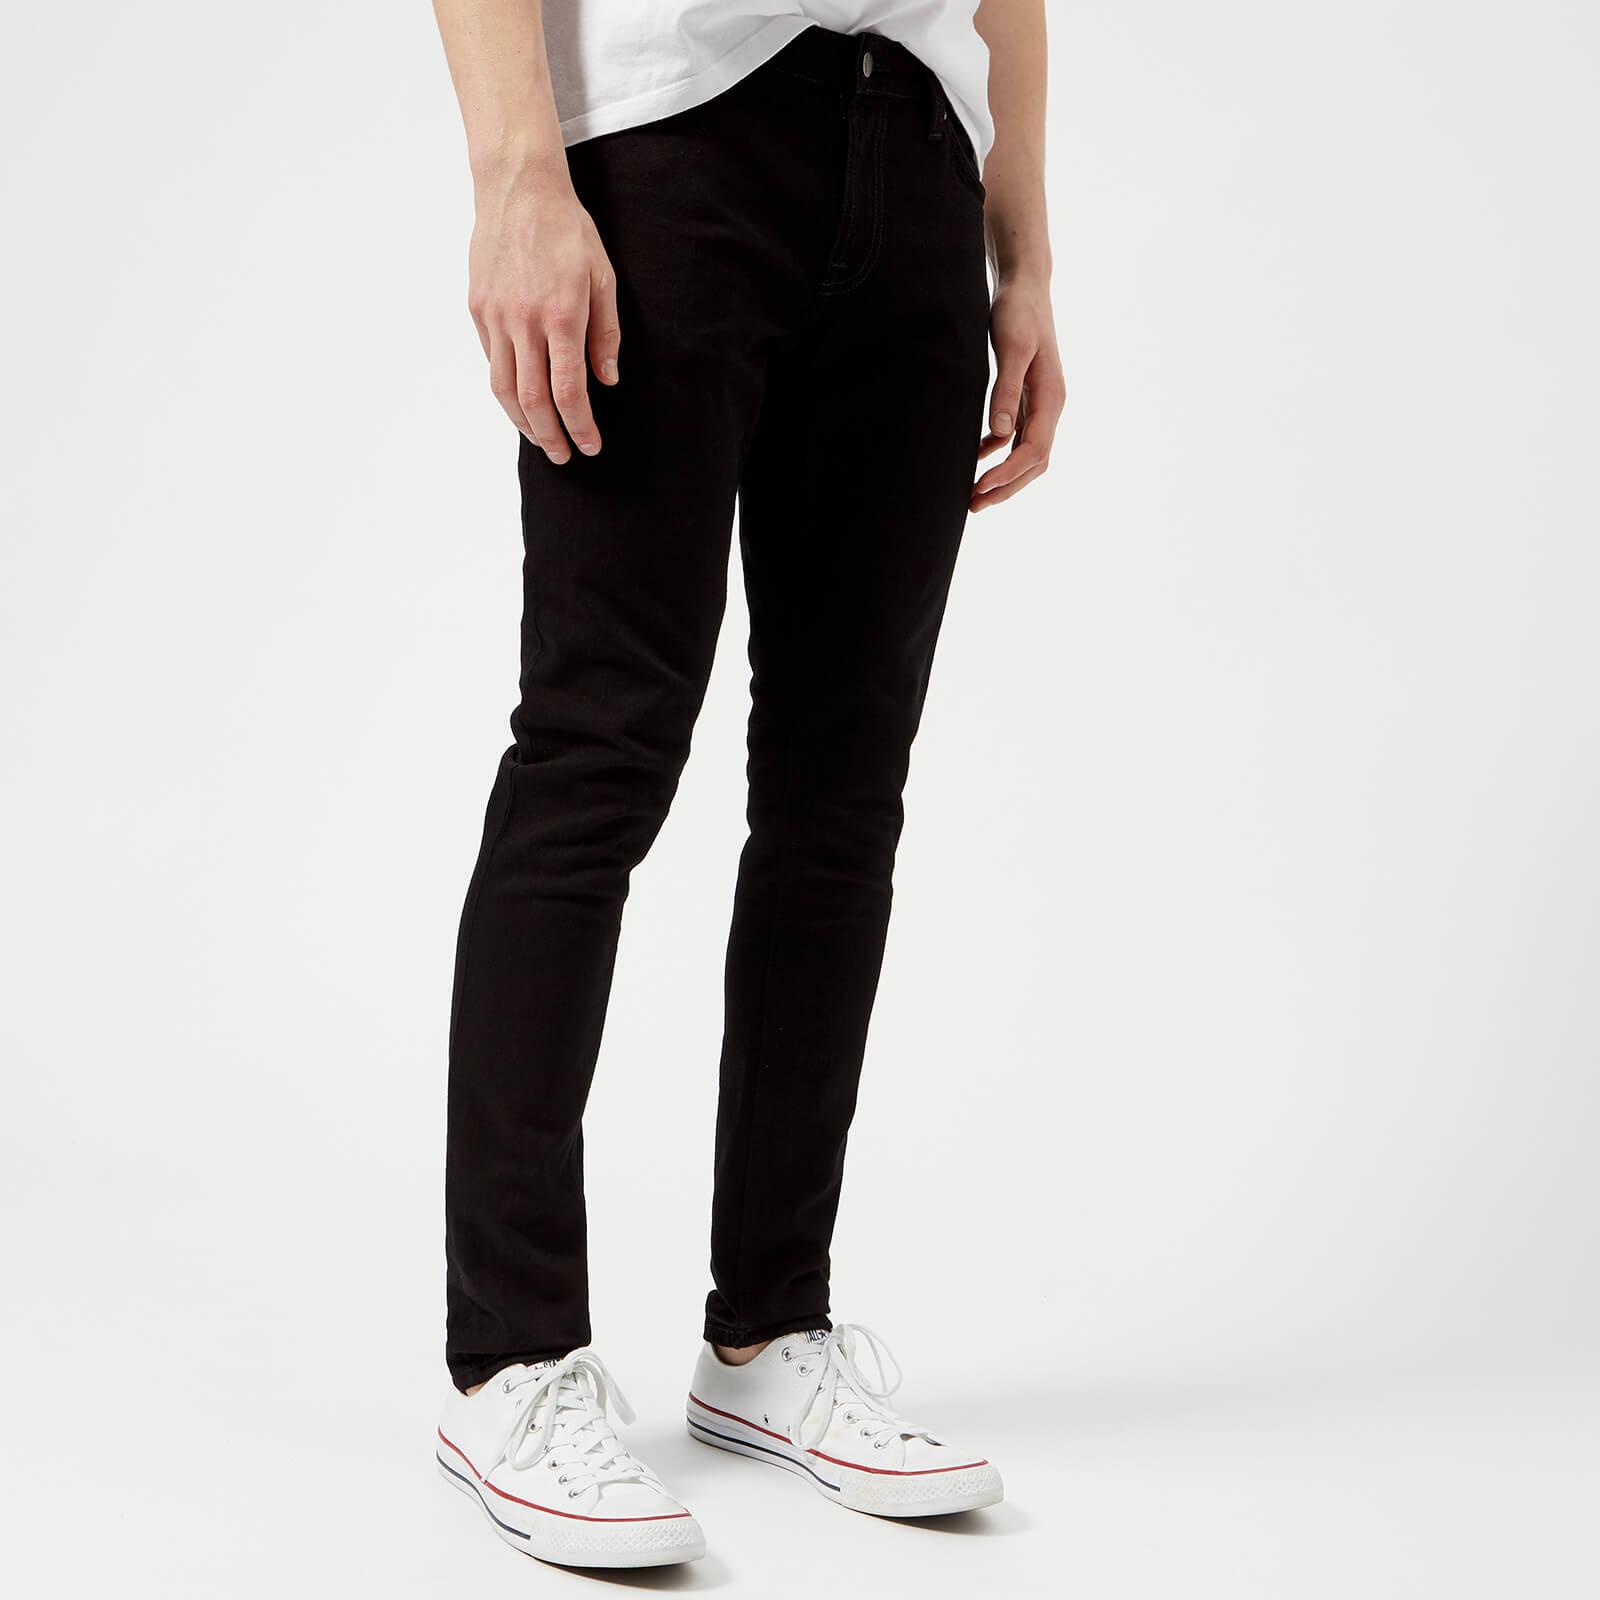 a0d14ed4394a Nudie Jeans Men s Skinny Lin Skinny Jeans - Black Black - Free UK Delivery  over £50